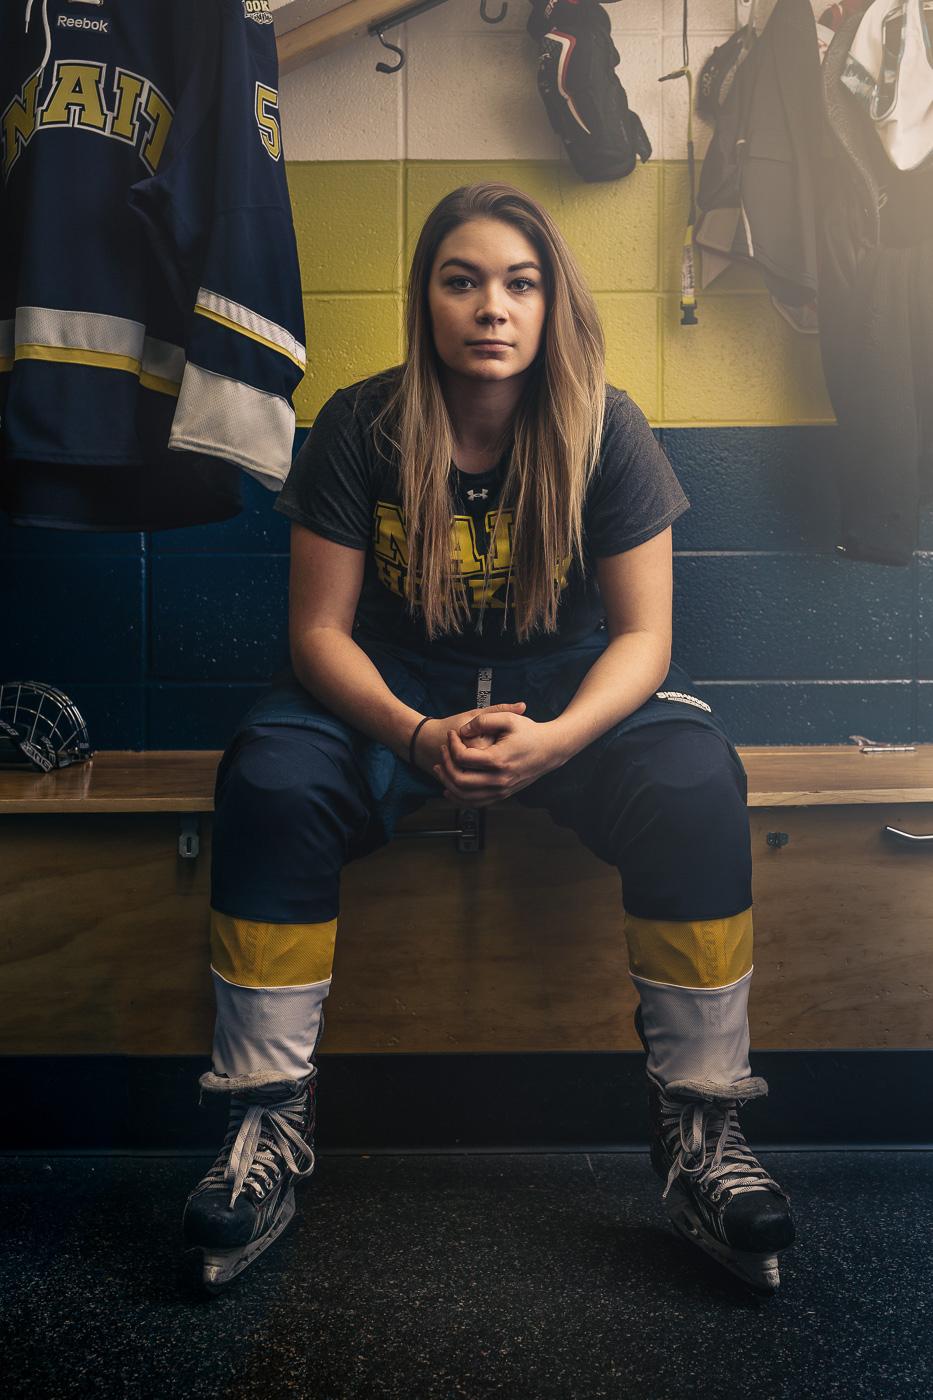 NAIT-Womens-Hockey-Student-Athlete-Portrait-black-and-white-20151207-_O6A8540-Edit-Web.jpg